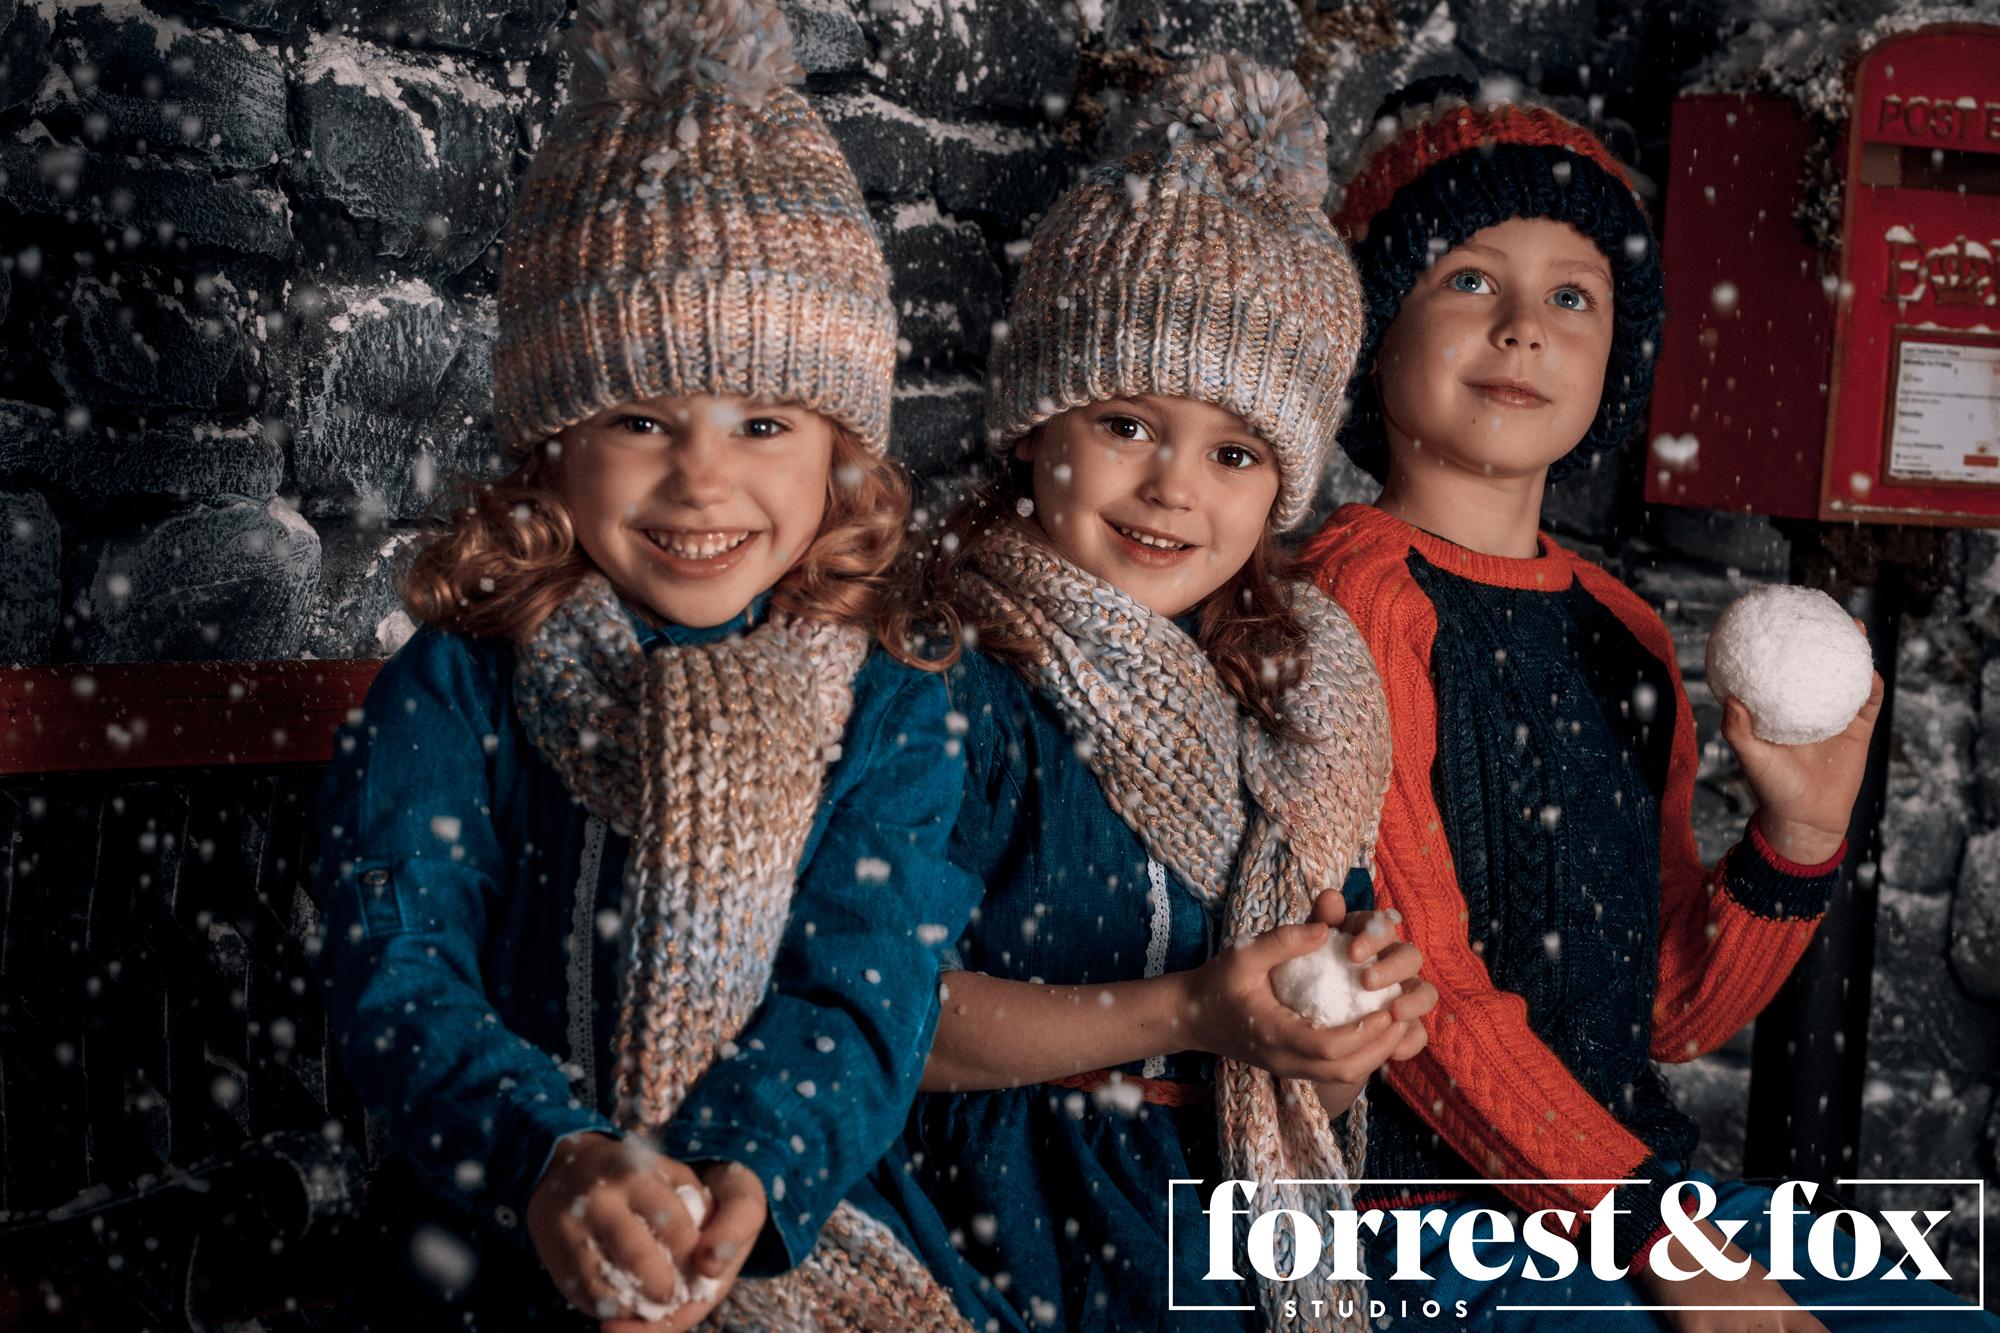 Lesley_Reynolds_Christmas_Sun_13_00-19-9